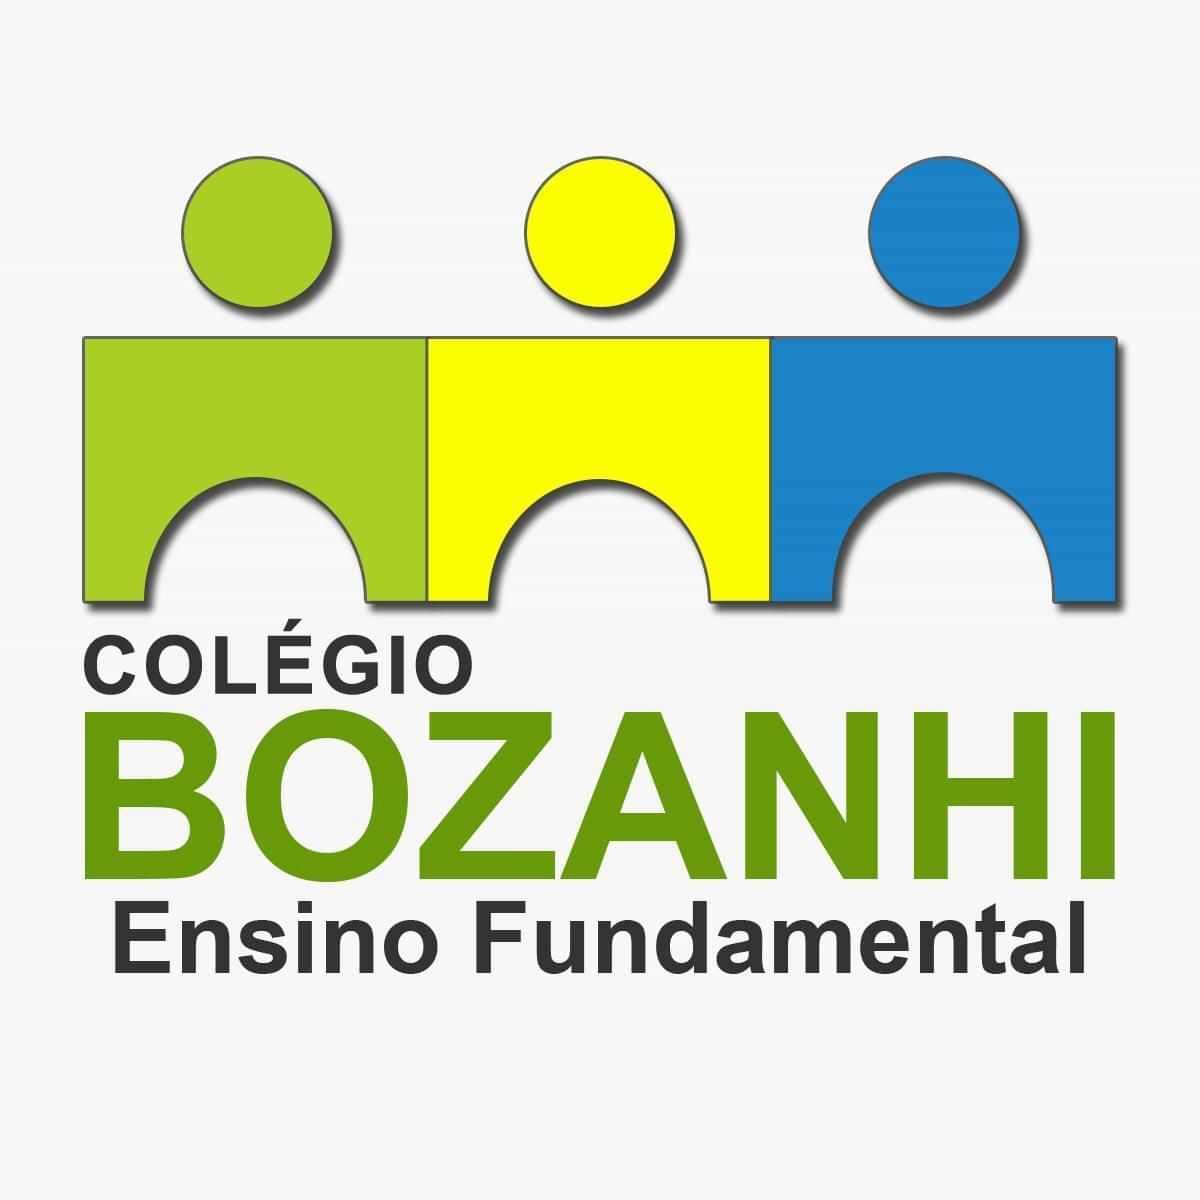 Colégio Bozanhi